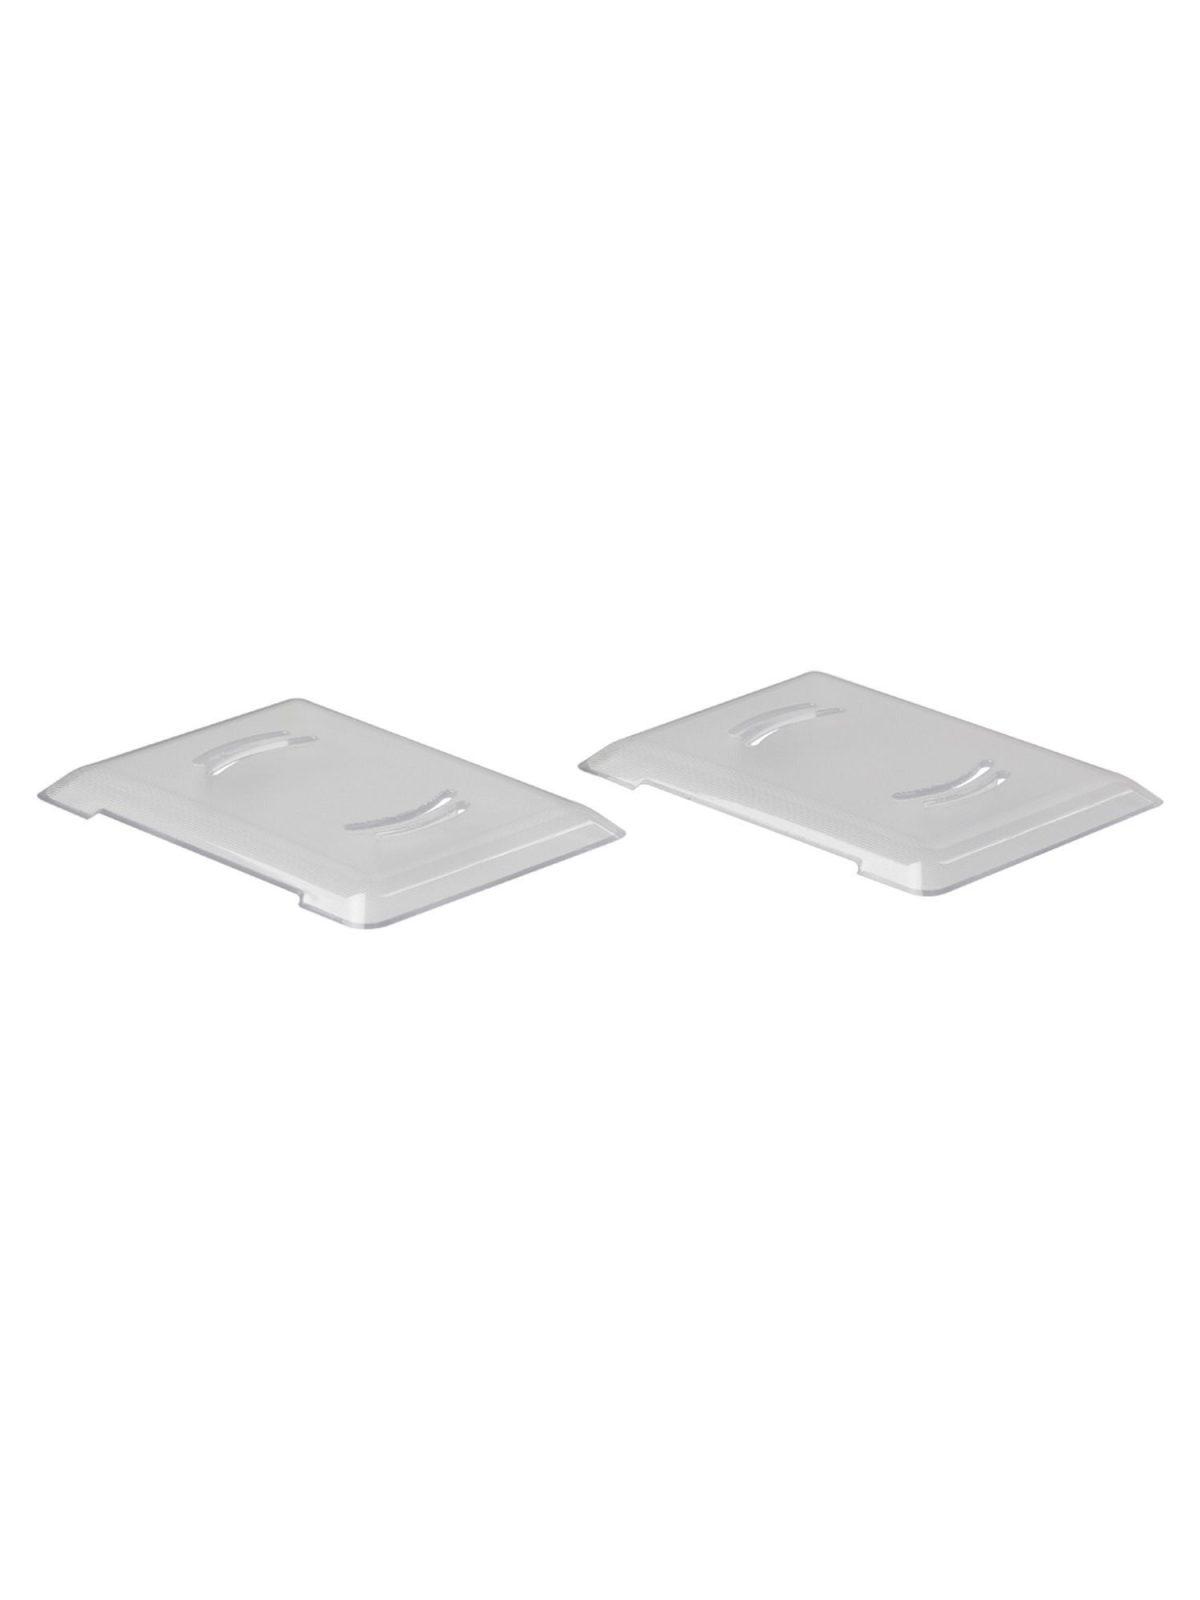 Tapa protectora luz frigoríficos Lynx, Bosch, Siemens, Balay